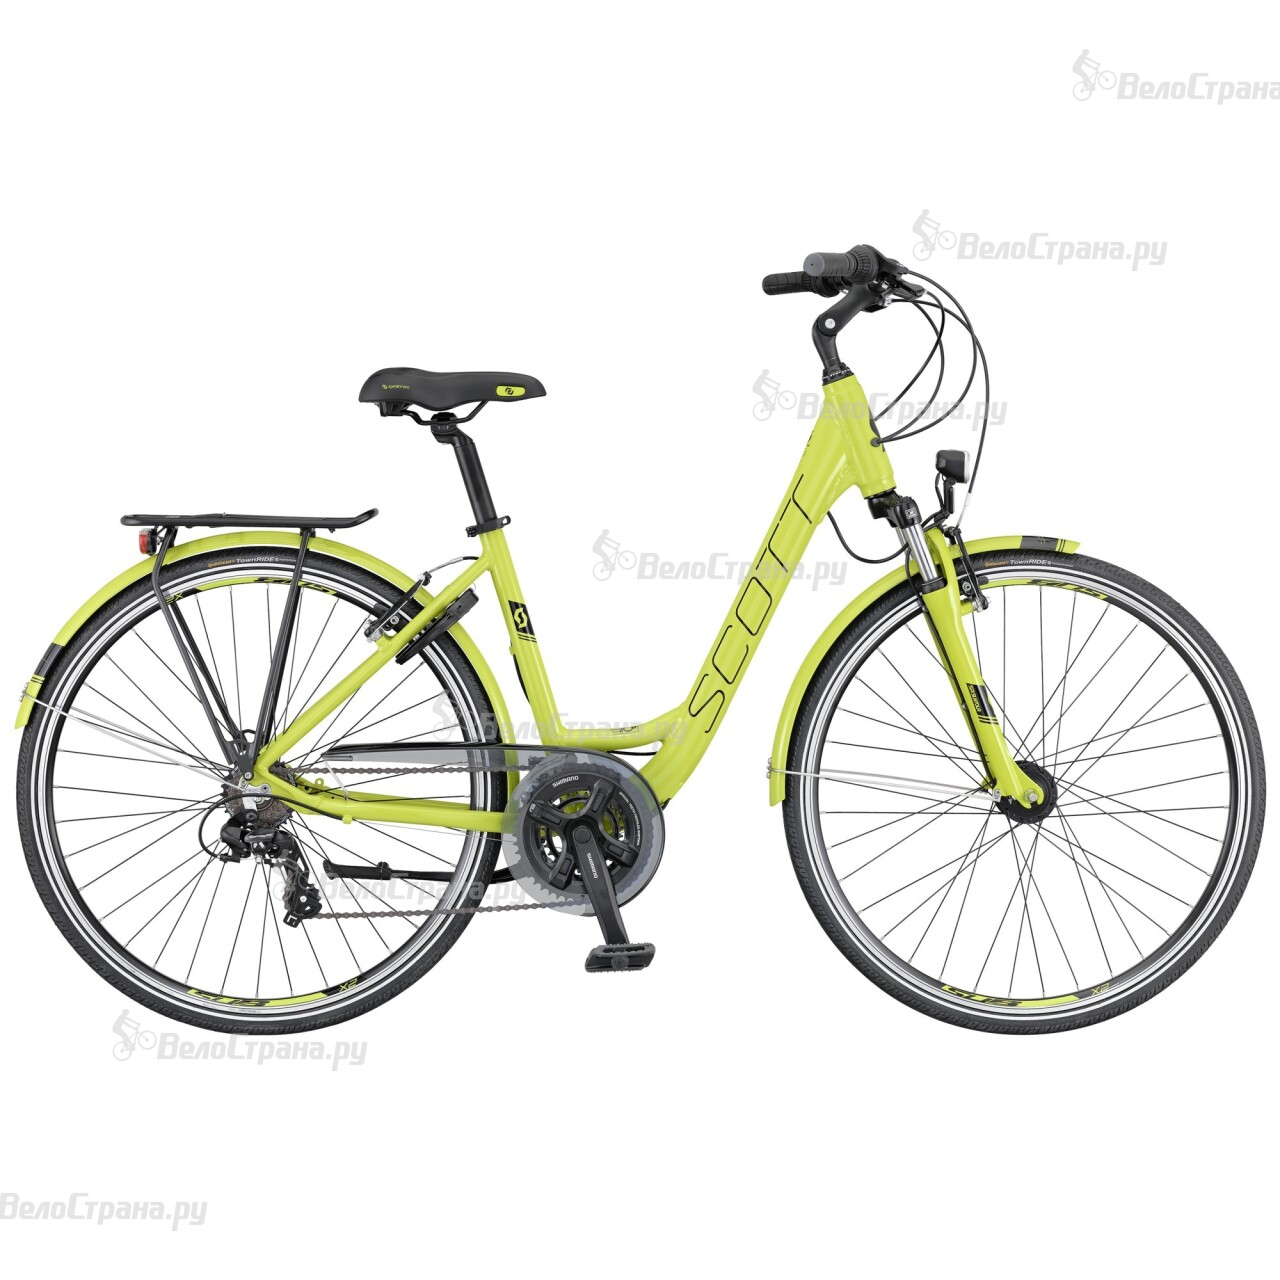 Велосипед Scott Sub Comfort 20 Unisex (2016)